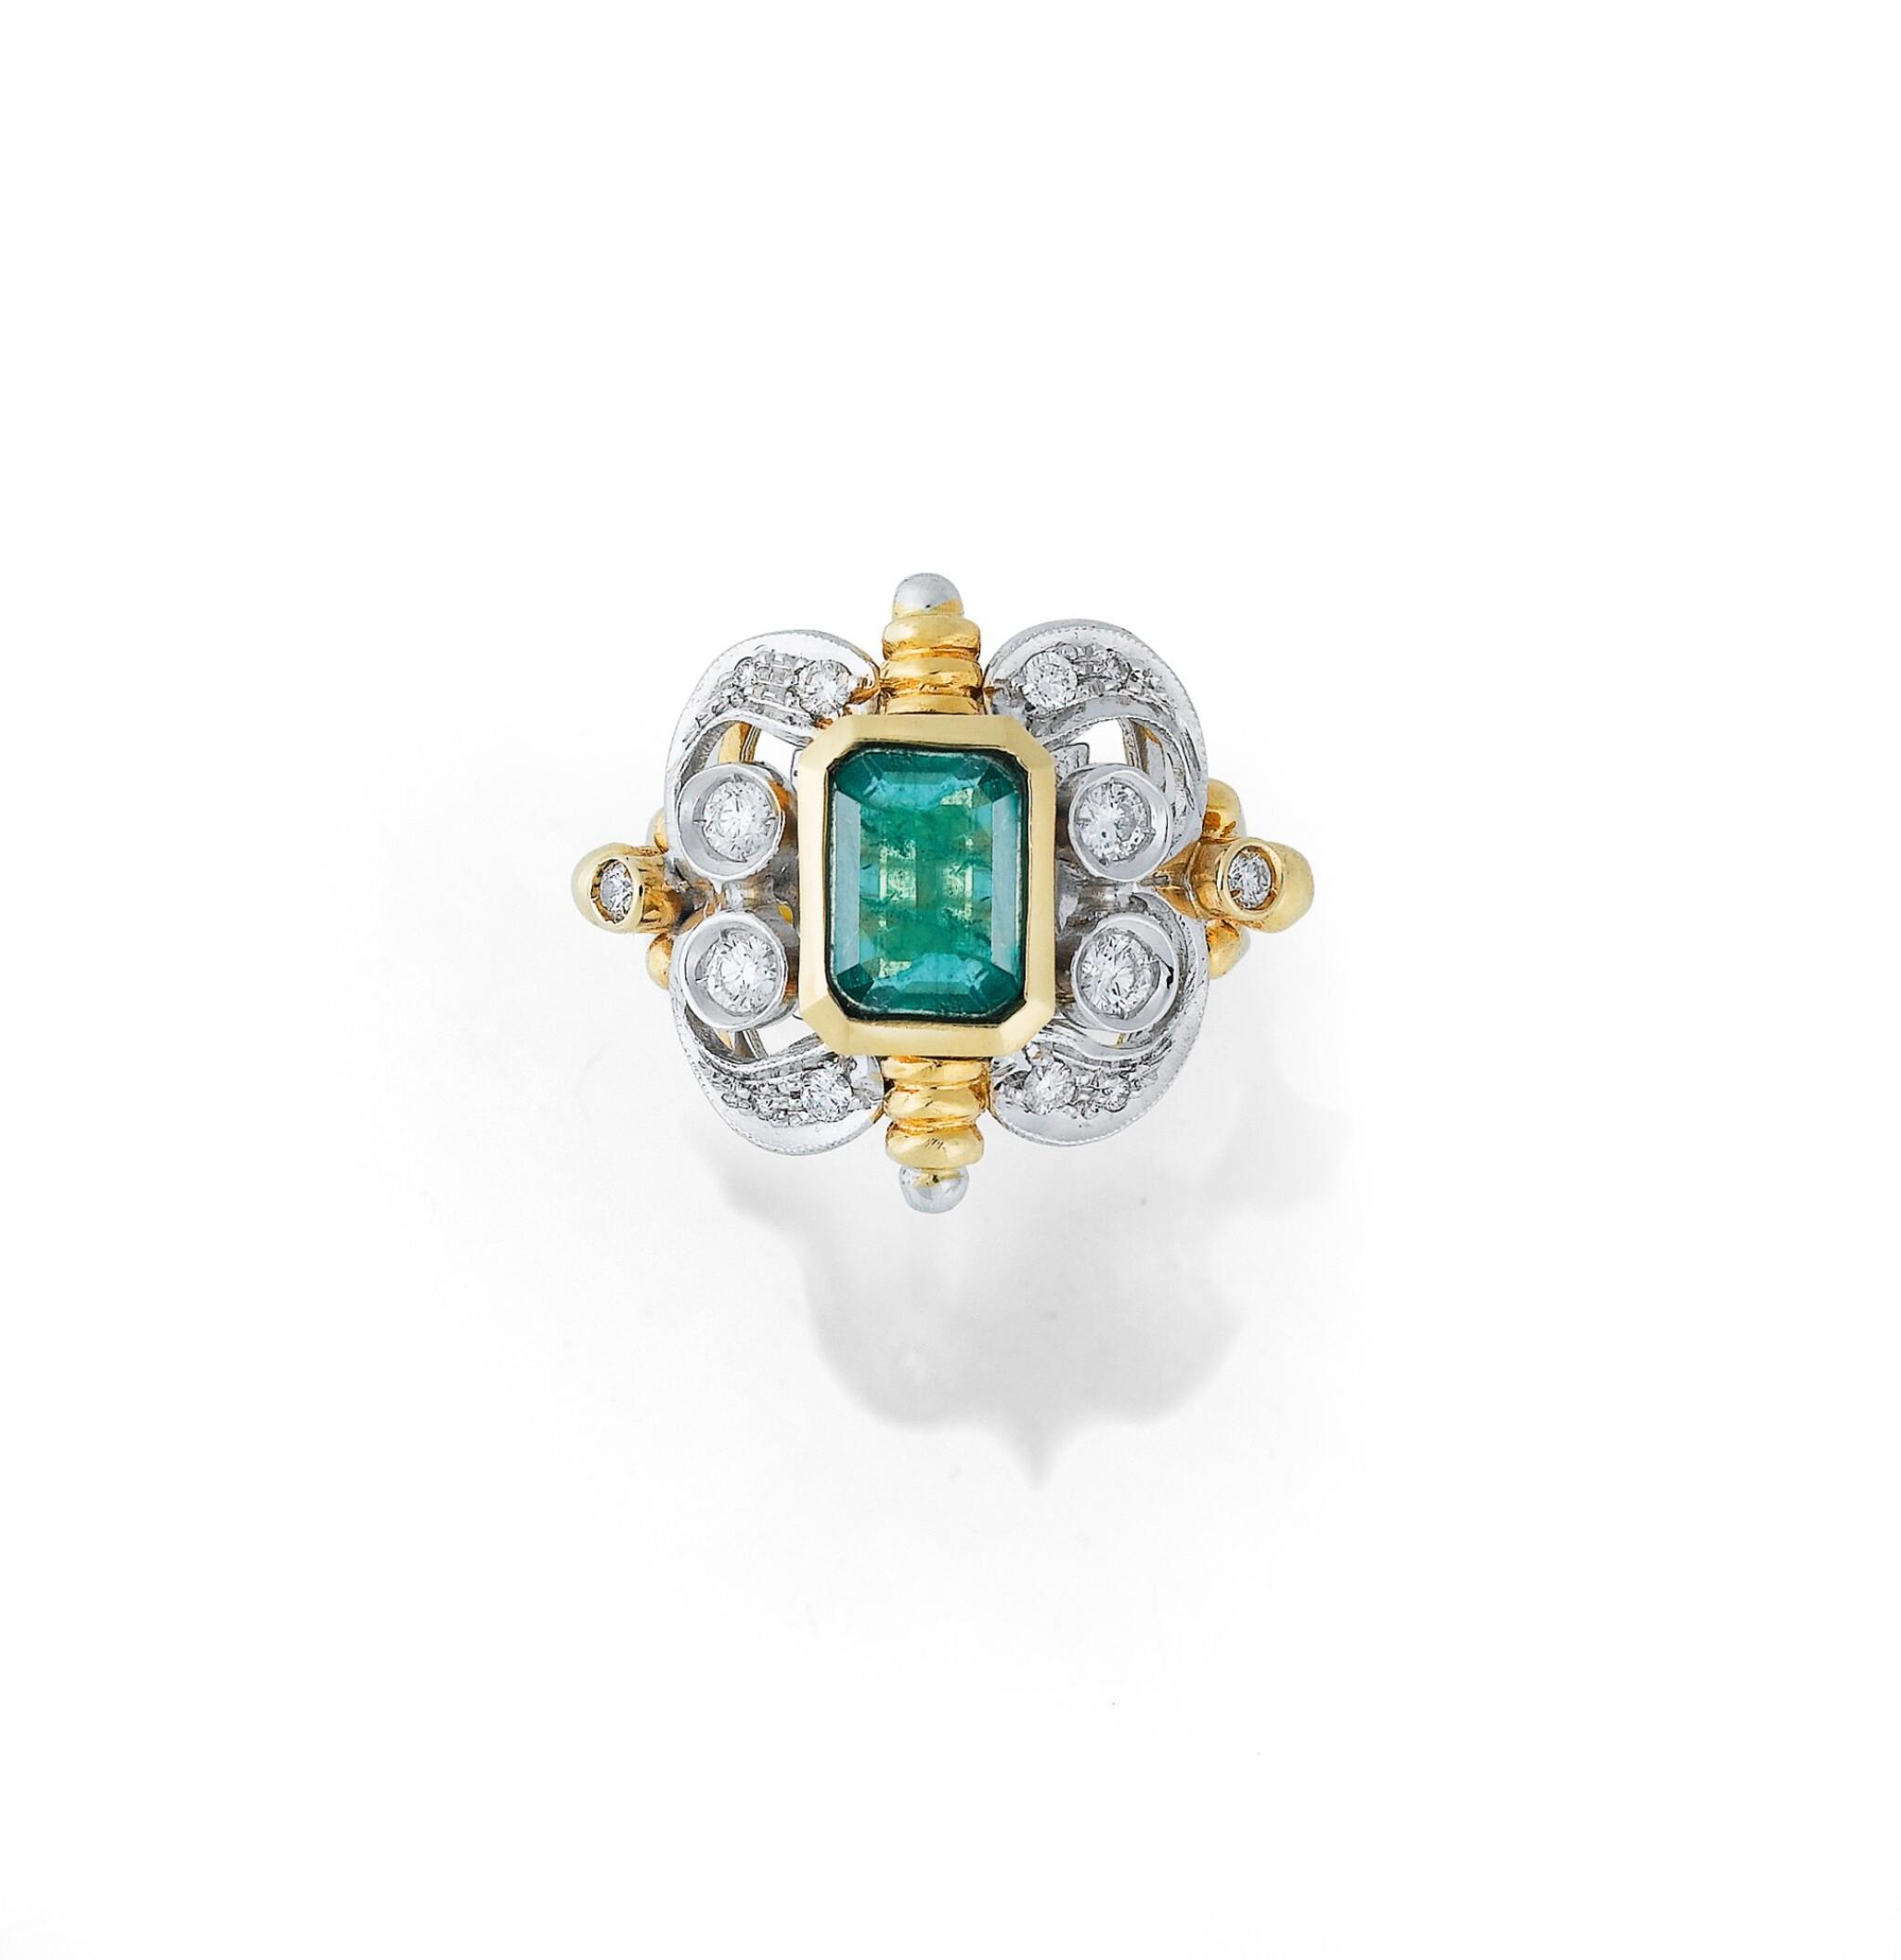 View full screen - View 1 of Lot 7. BAGUE ÉMERAUDE ET DIAMANTS | EMERALD AND DIAMOND RING.